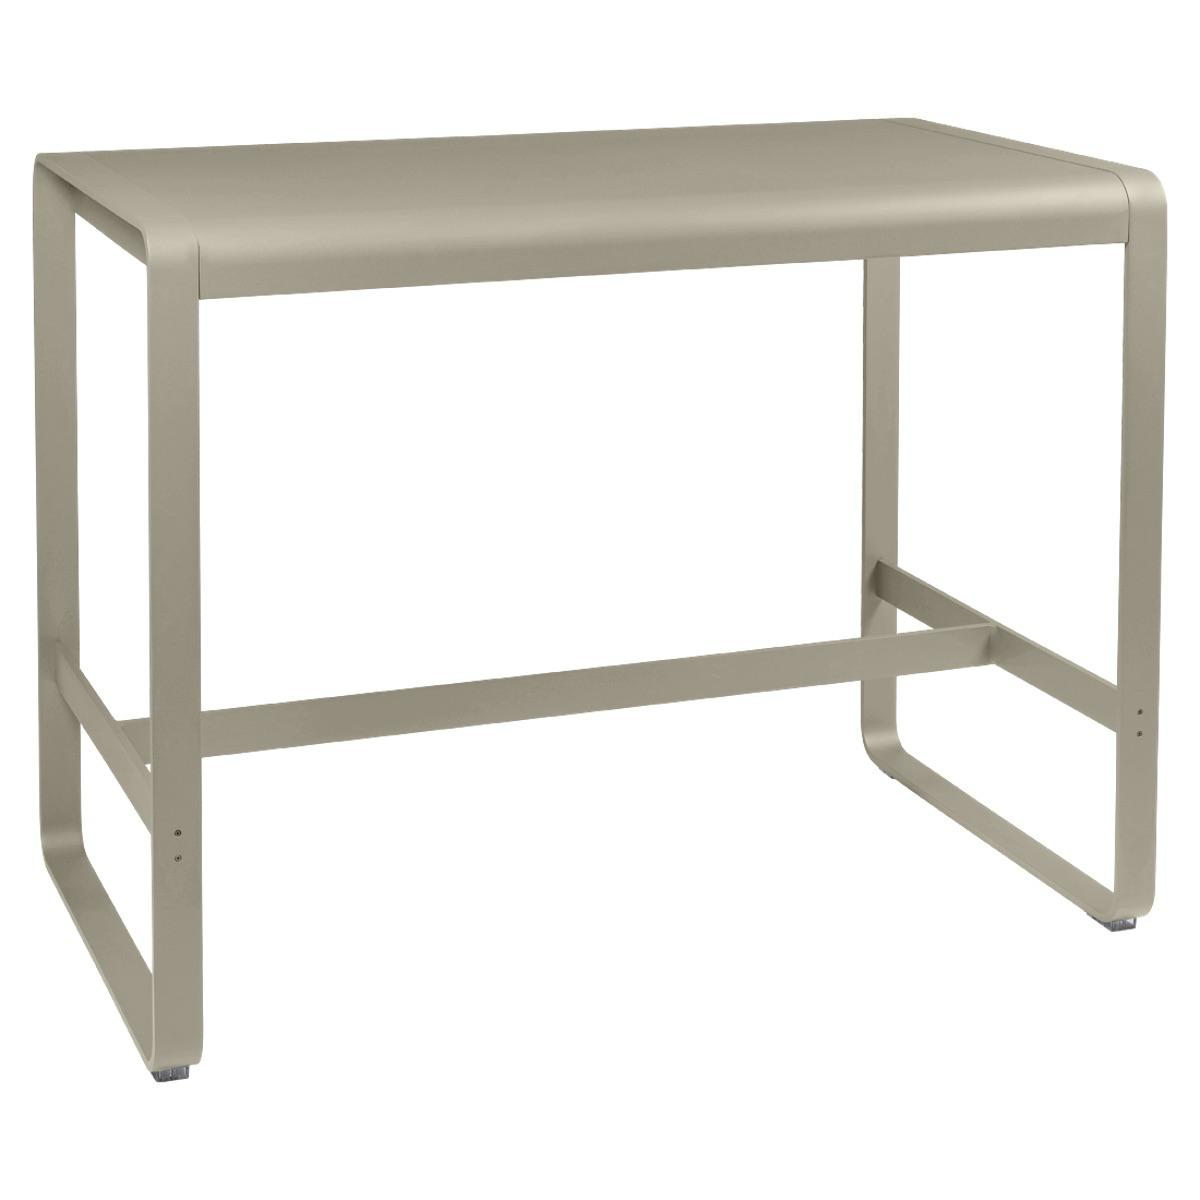 Table haute 80x140cm BELLEVIE Fermob muscade